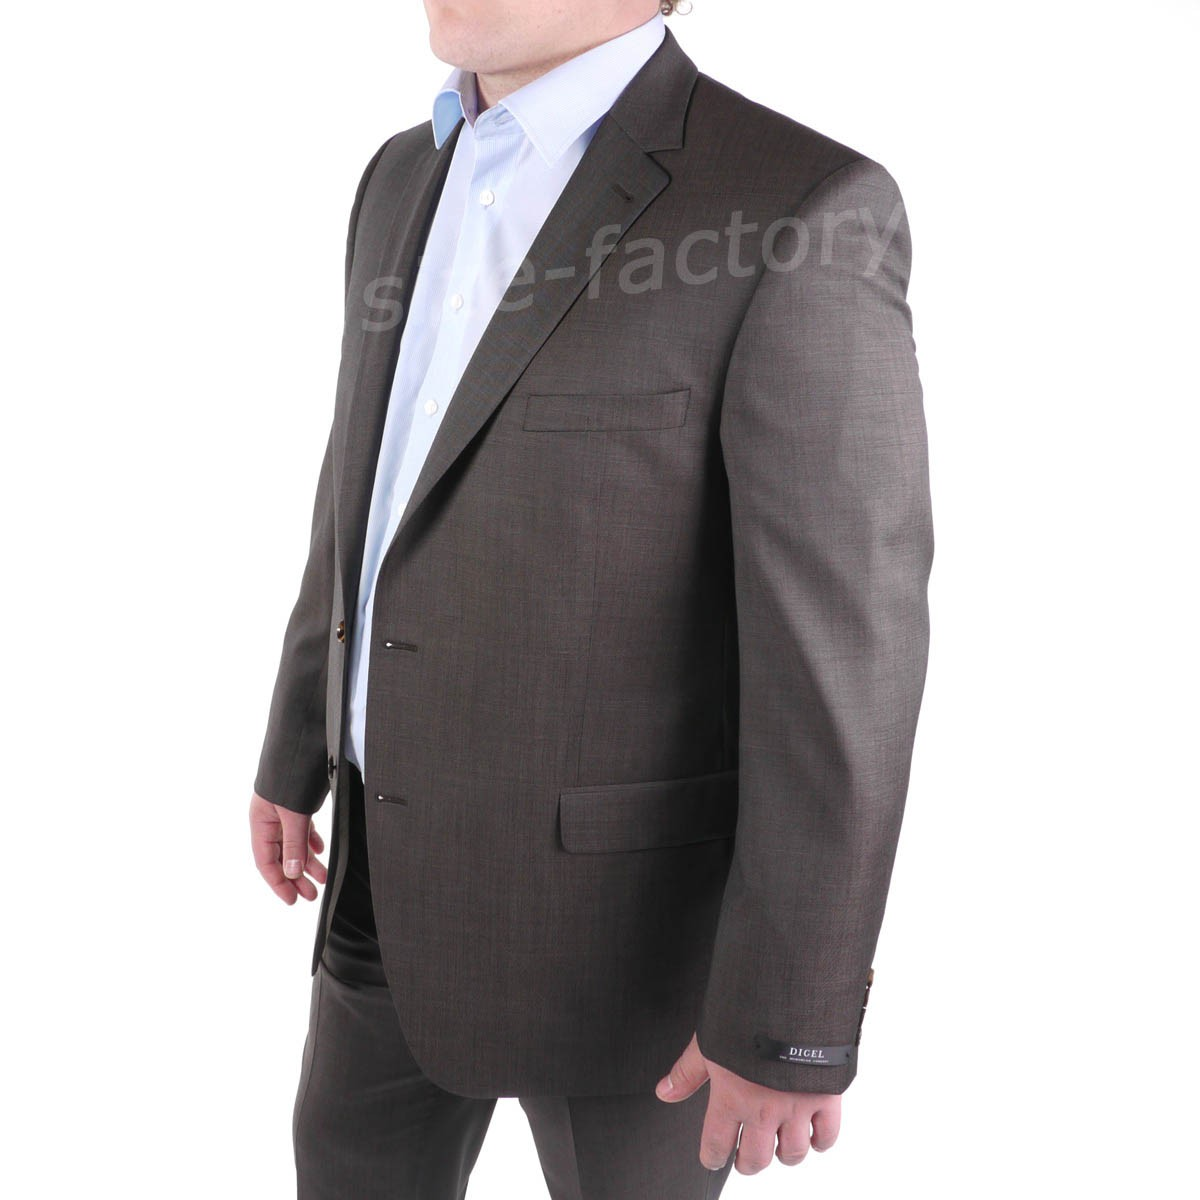 veste de costume pr f rence marron pour homme fort du 62 au 68 size factory digel. Black Bedroom Furniture Sets. Home Design Ideas